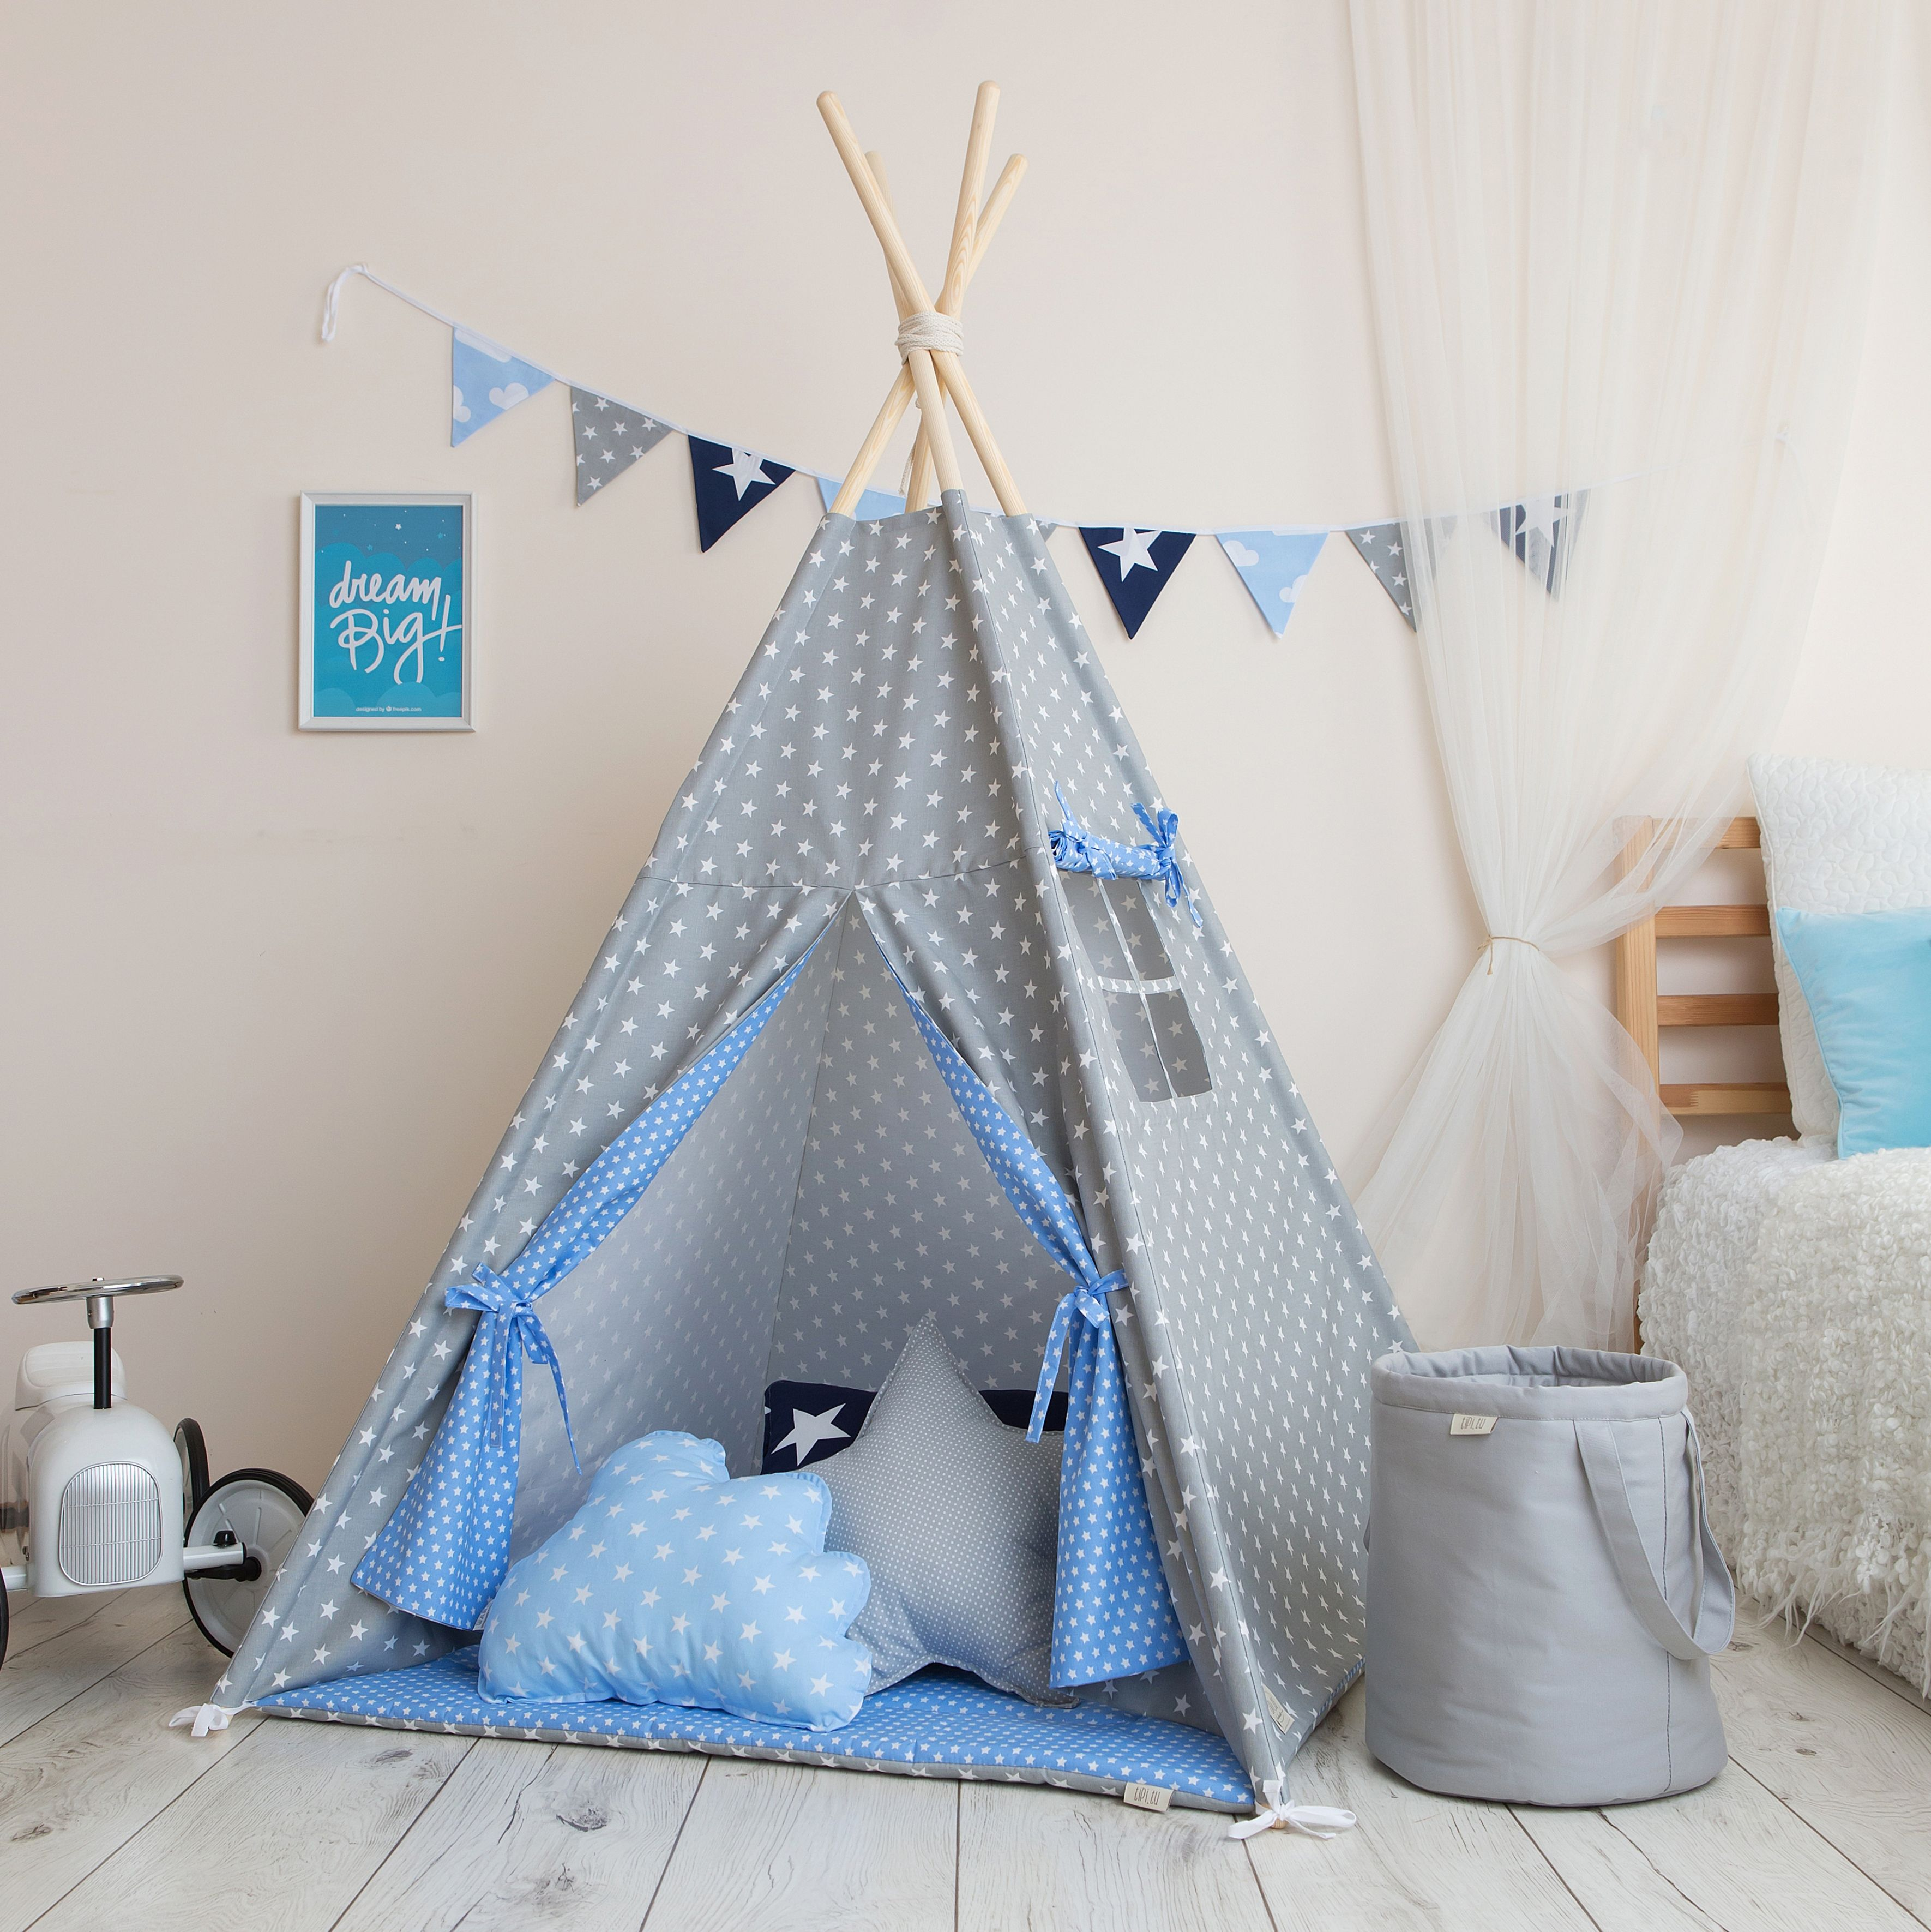 Grey And Blue Stars High Quality Teepee Teepee Fabric Teepee Child Protection